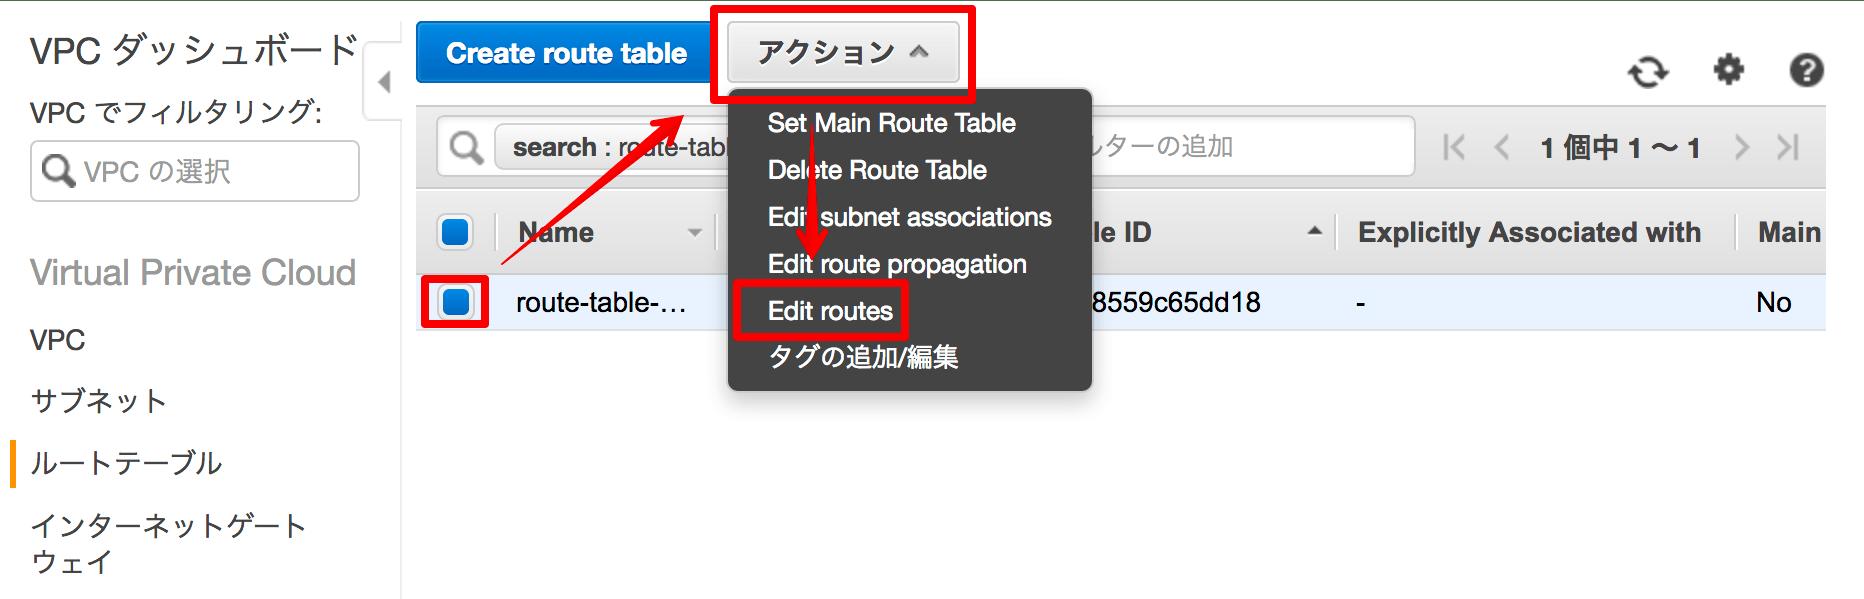 Route Tables   VPC Management Console_2018-12-11_20-02-42.png